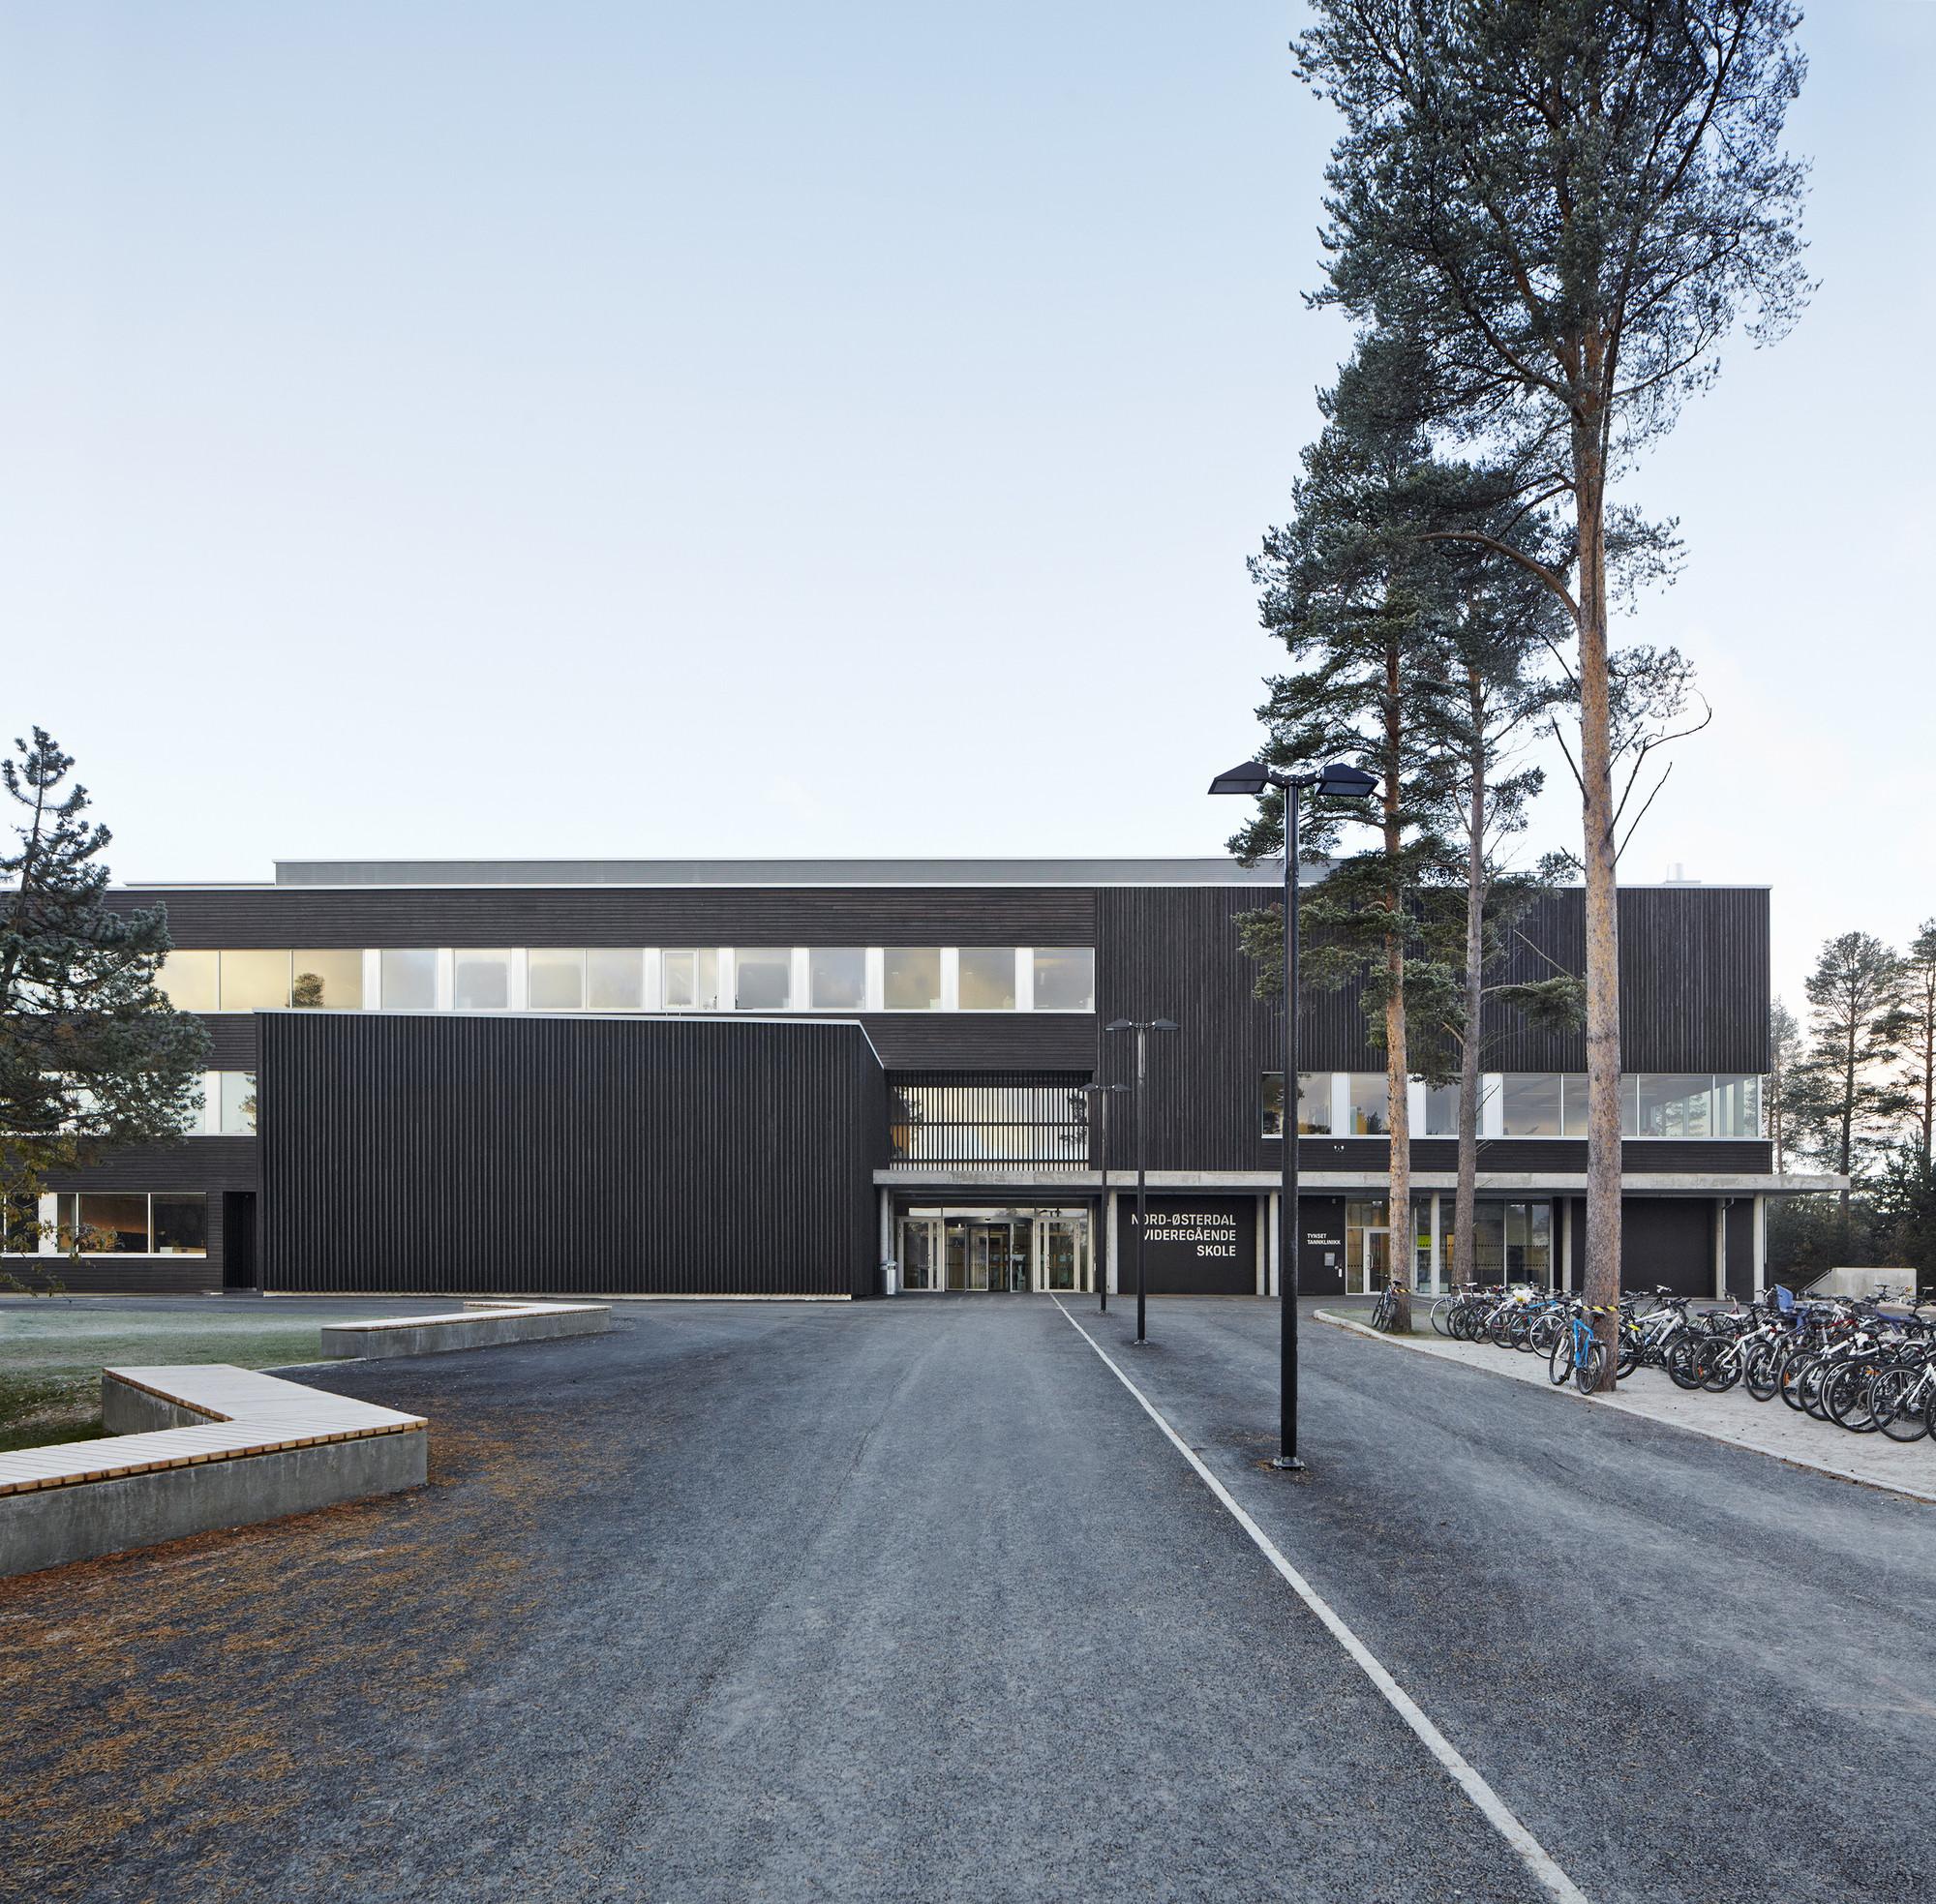 Nord-Østerdal High School / Longva arkitekter , © Ivan Brodey